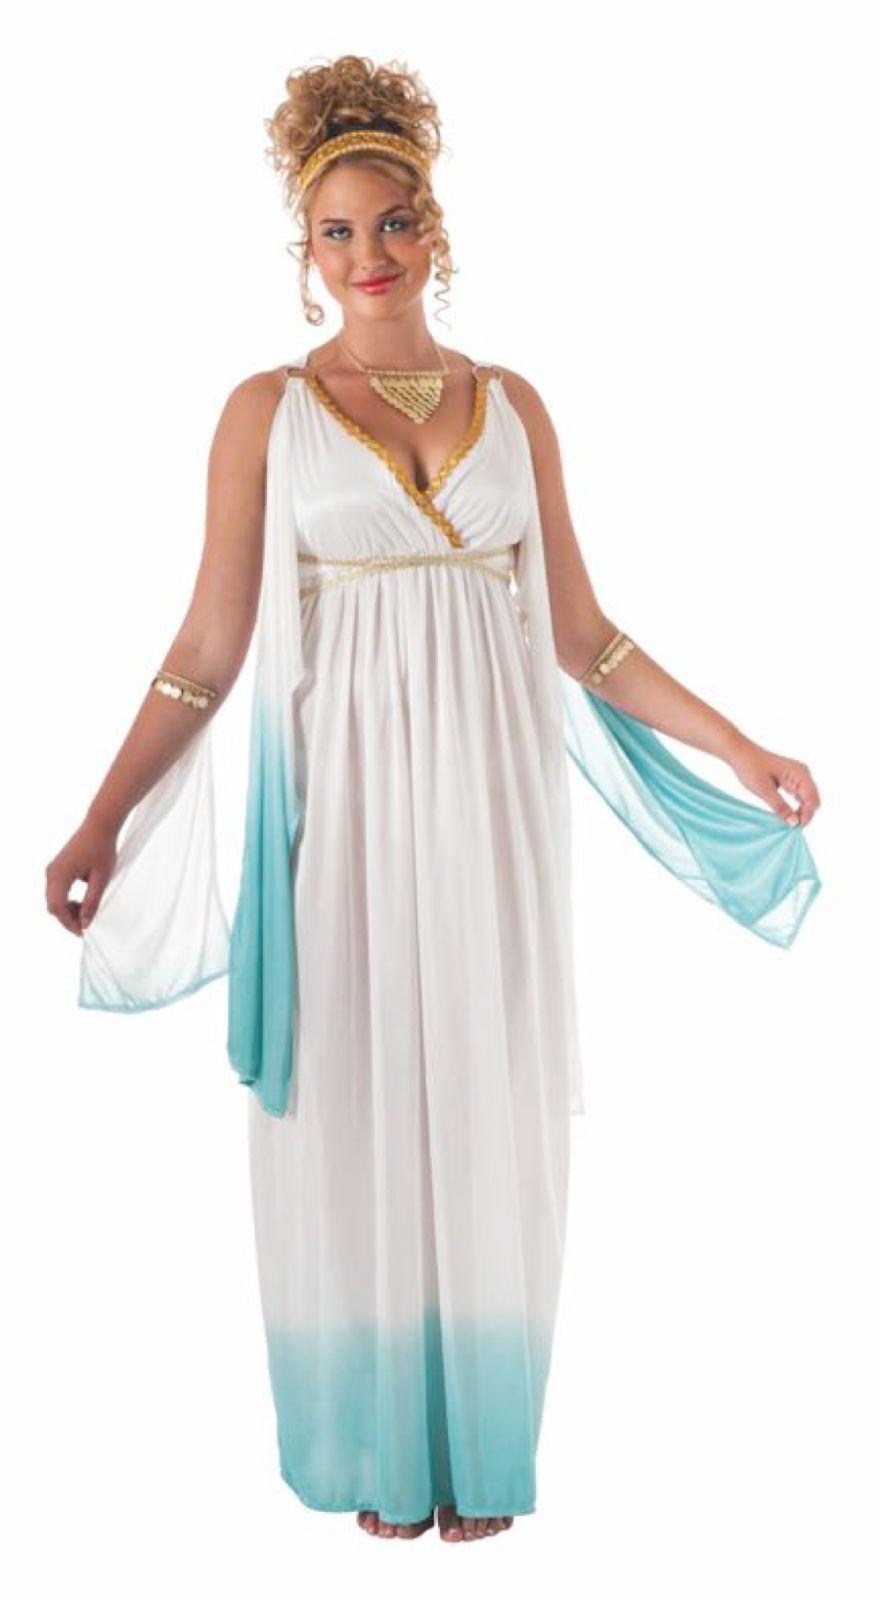 Image 0 of White Grecian Goddess Plus Size Ladies Adult Costume, Rubies 17785